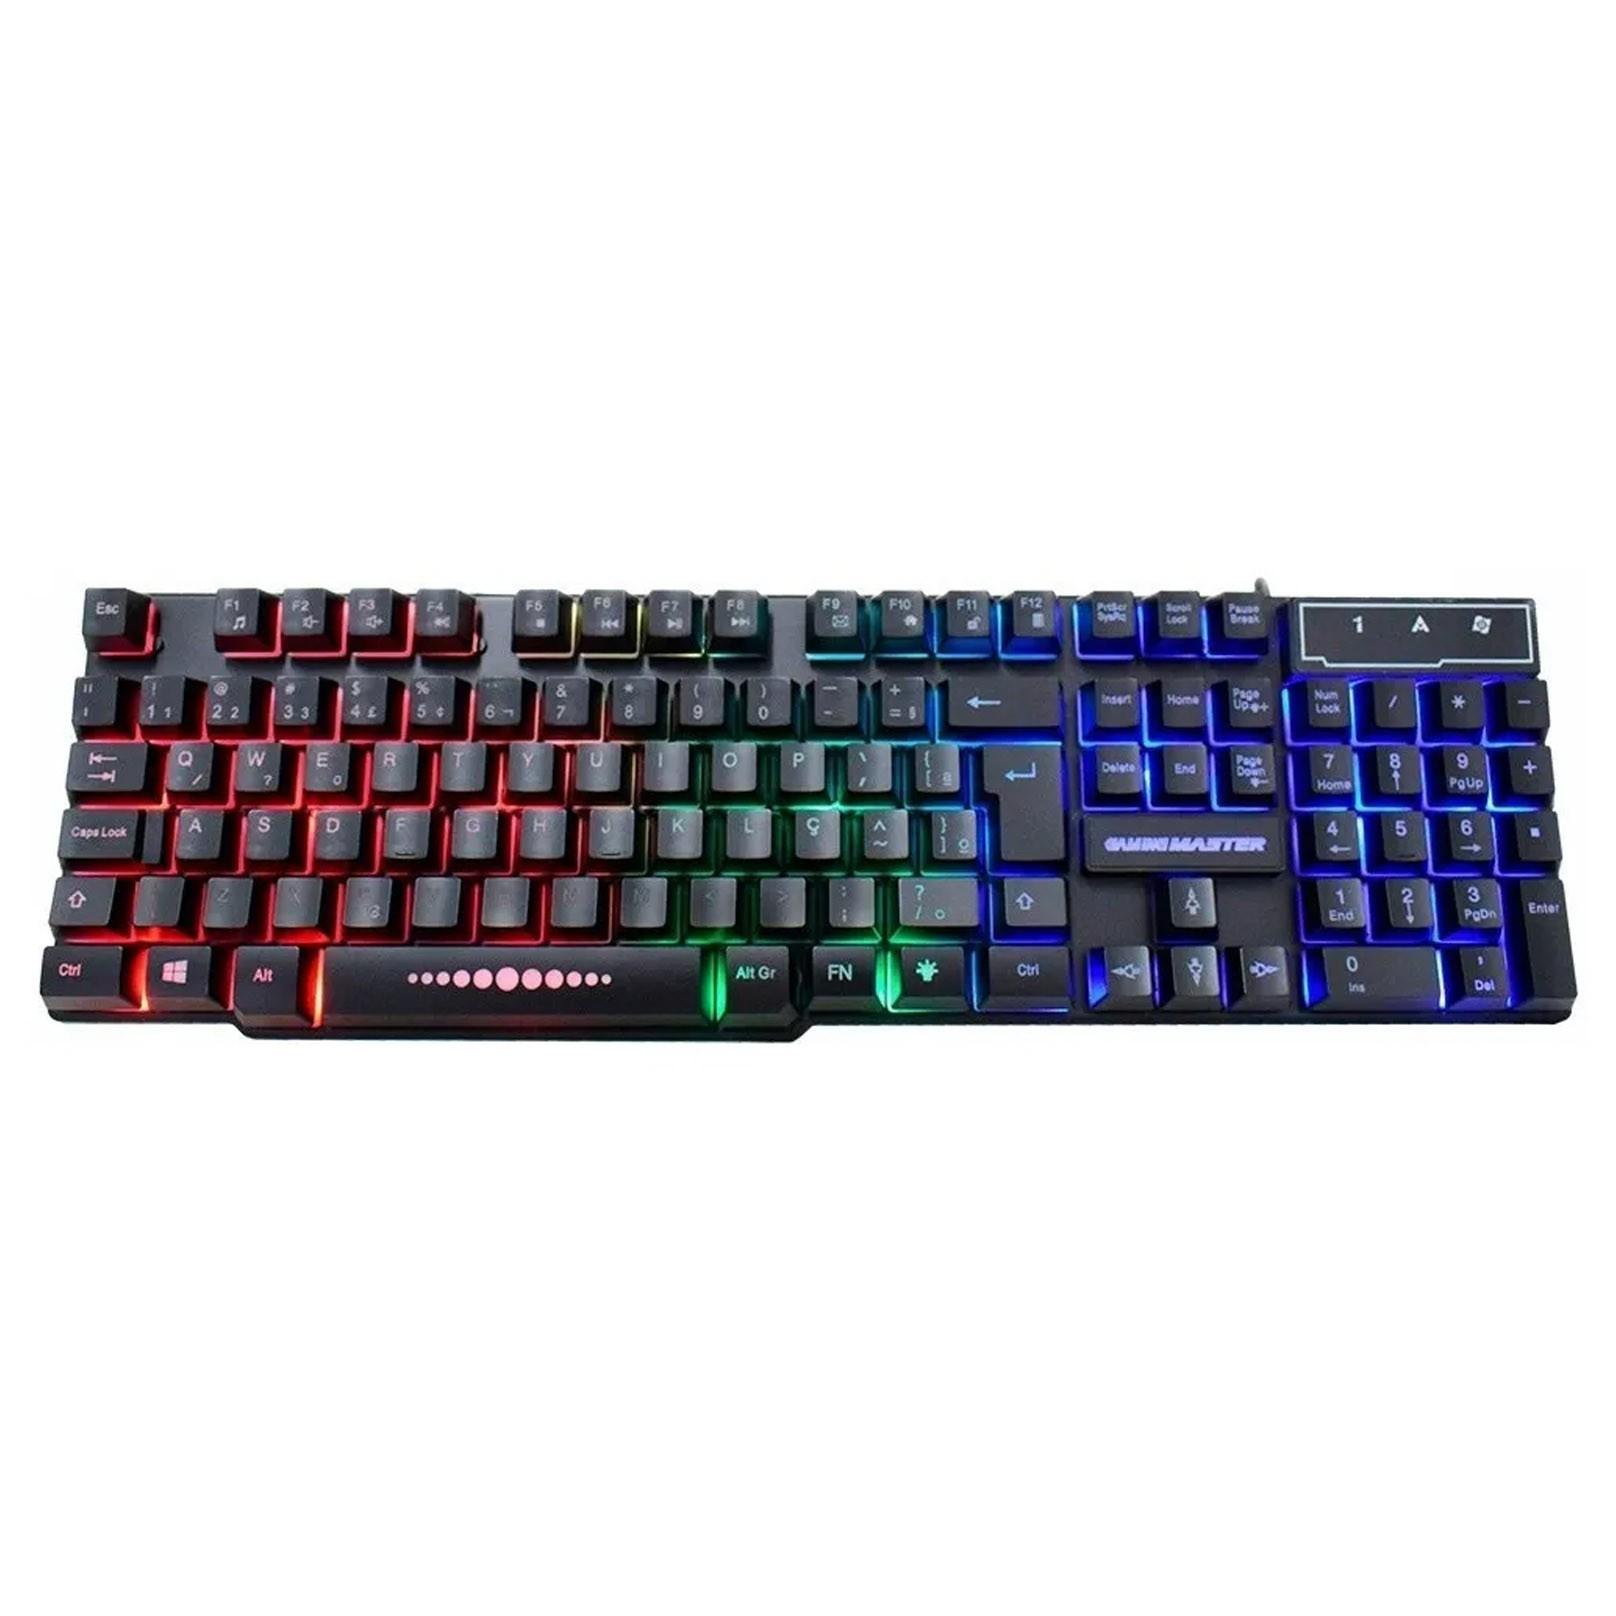 Teclado Gamer Km52 K-mex Led RGB Usb Semi Mecanico Abnt2 - KM-5228